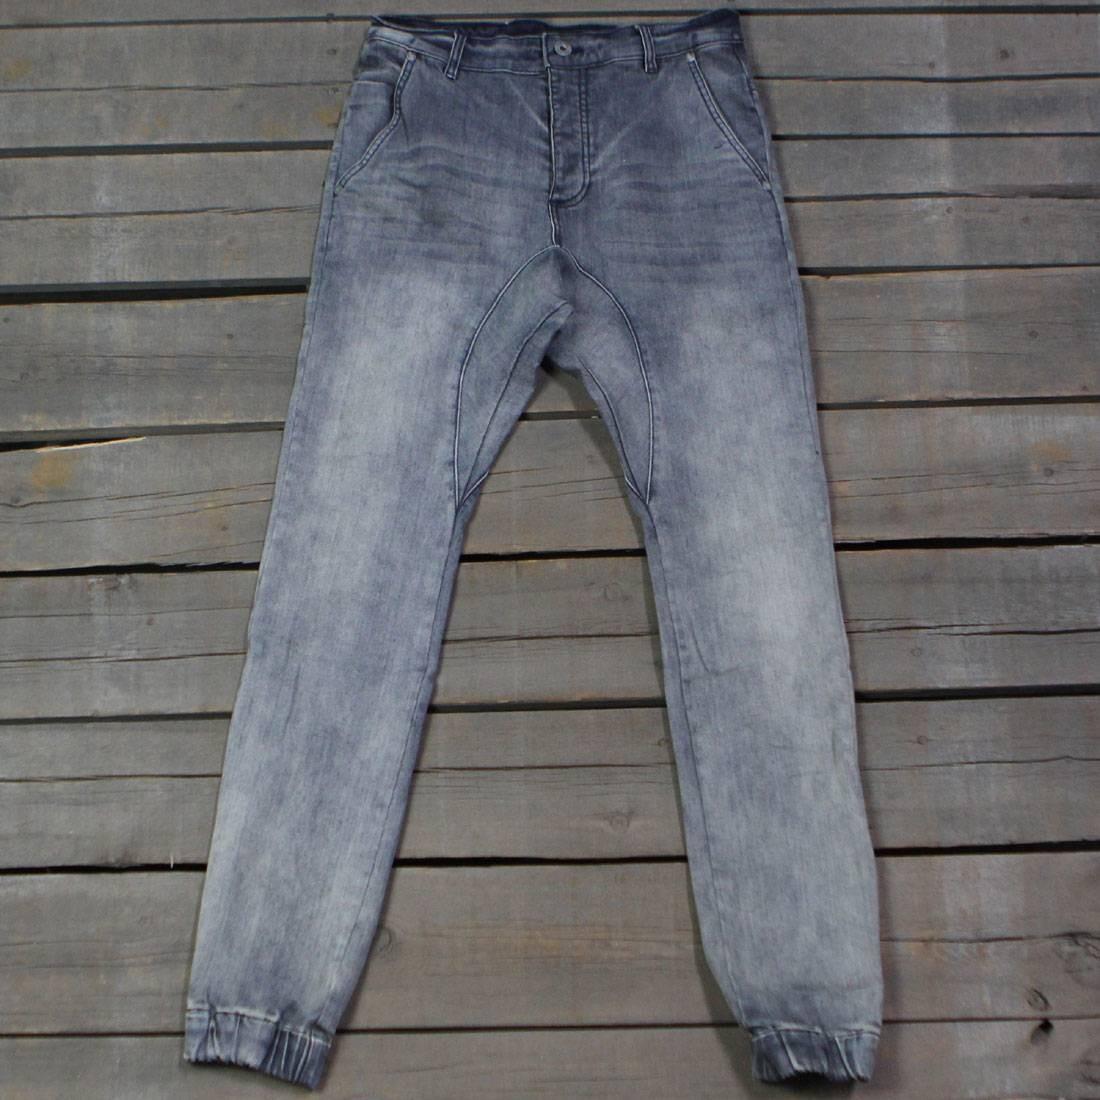 Zanerobe Men Slingshot Denim Pants (blue / gray)